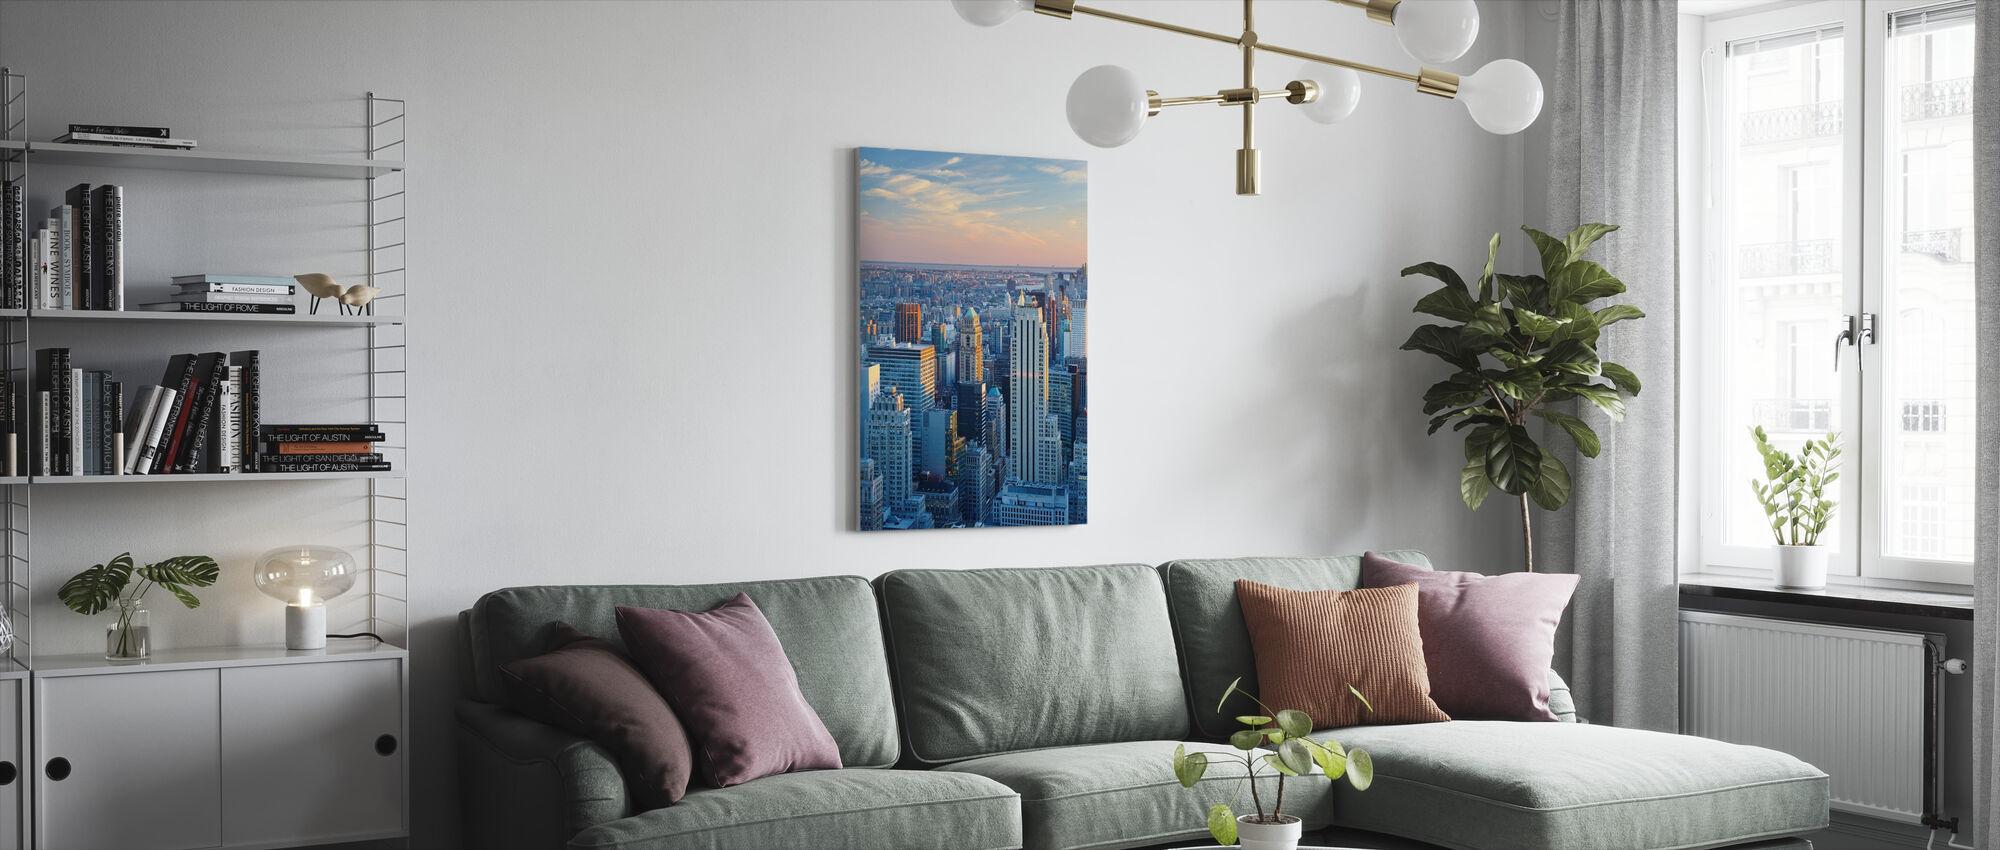 Manhattan i blått lys - Lerretsbilde - Stue